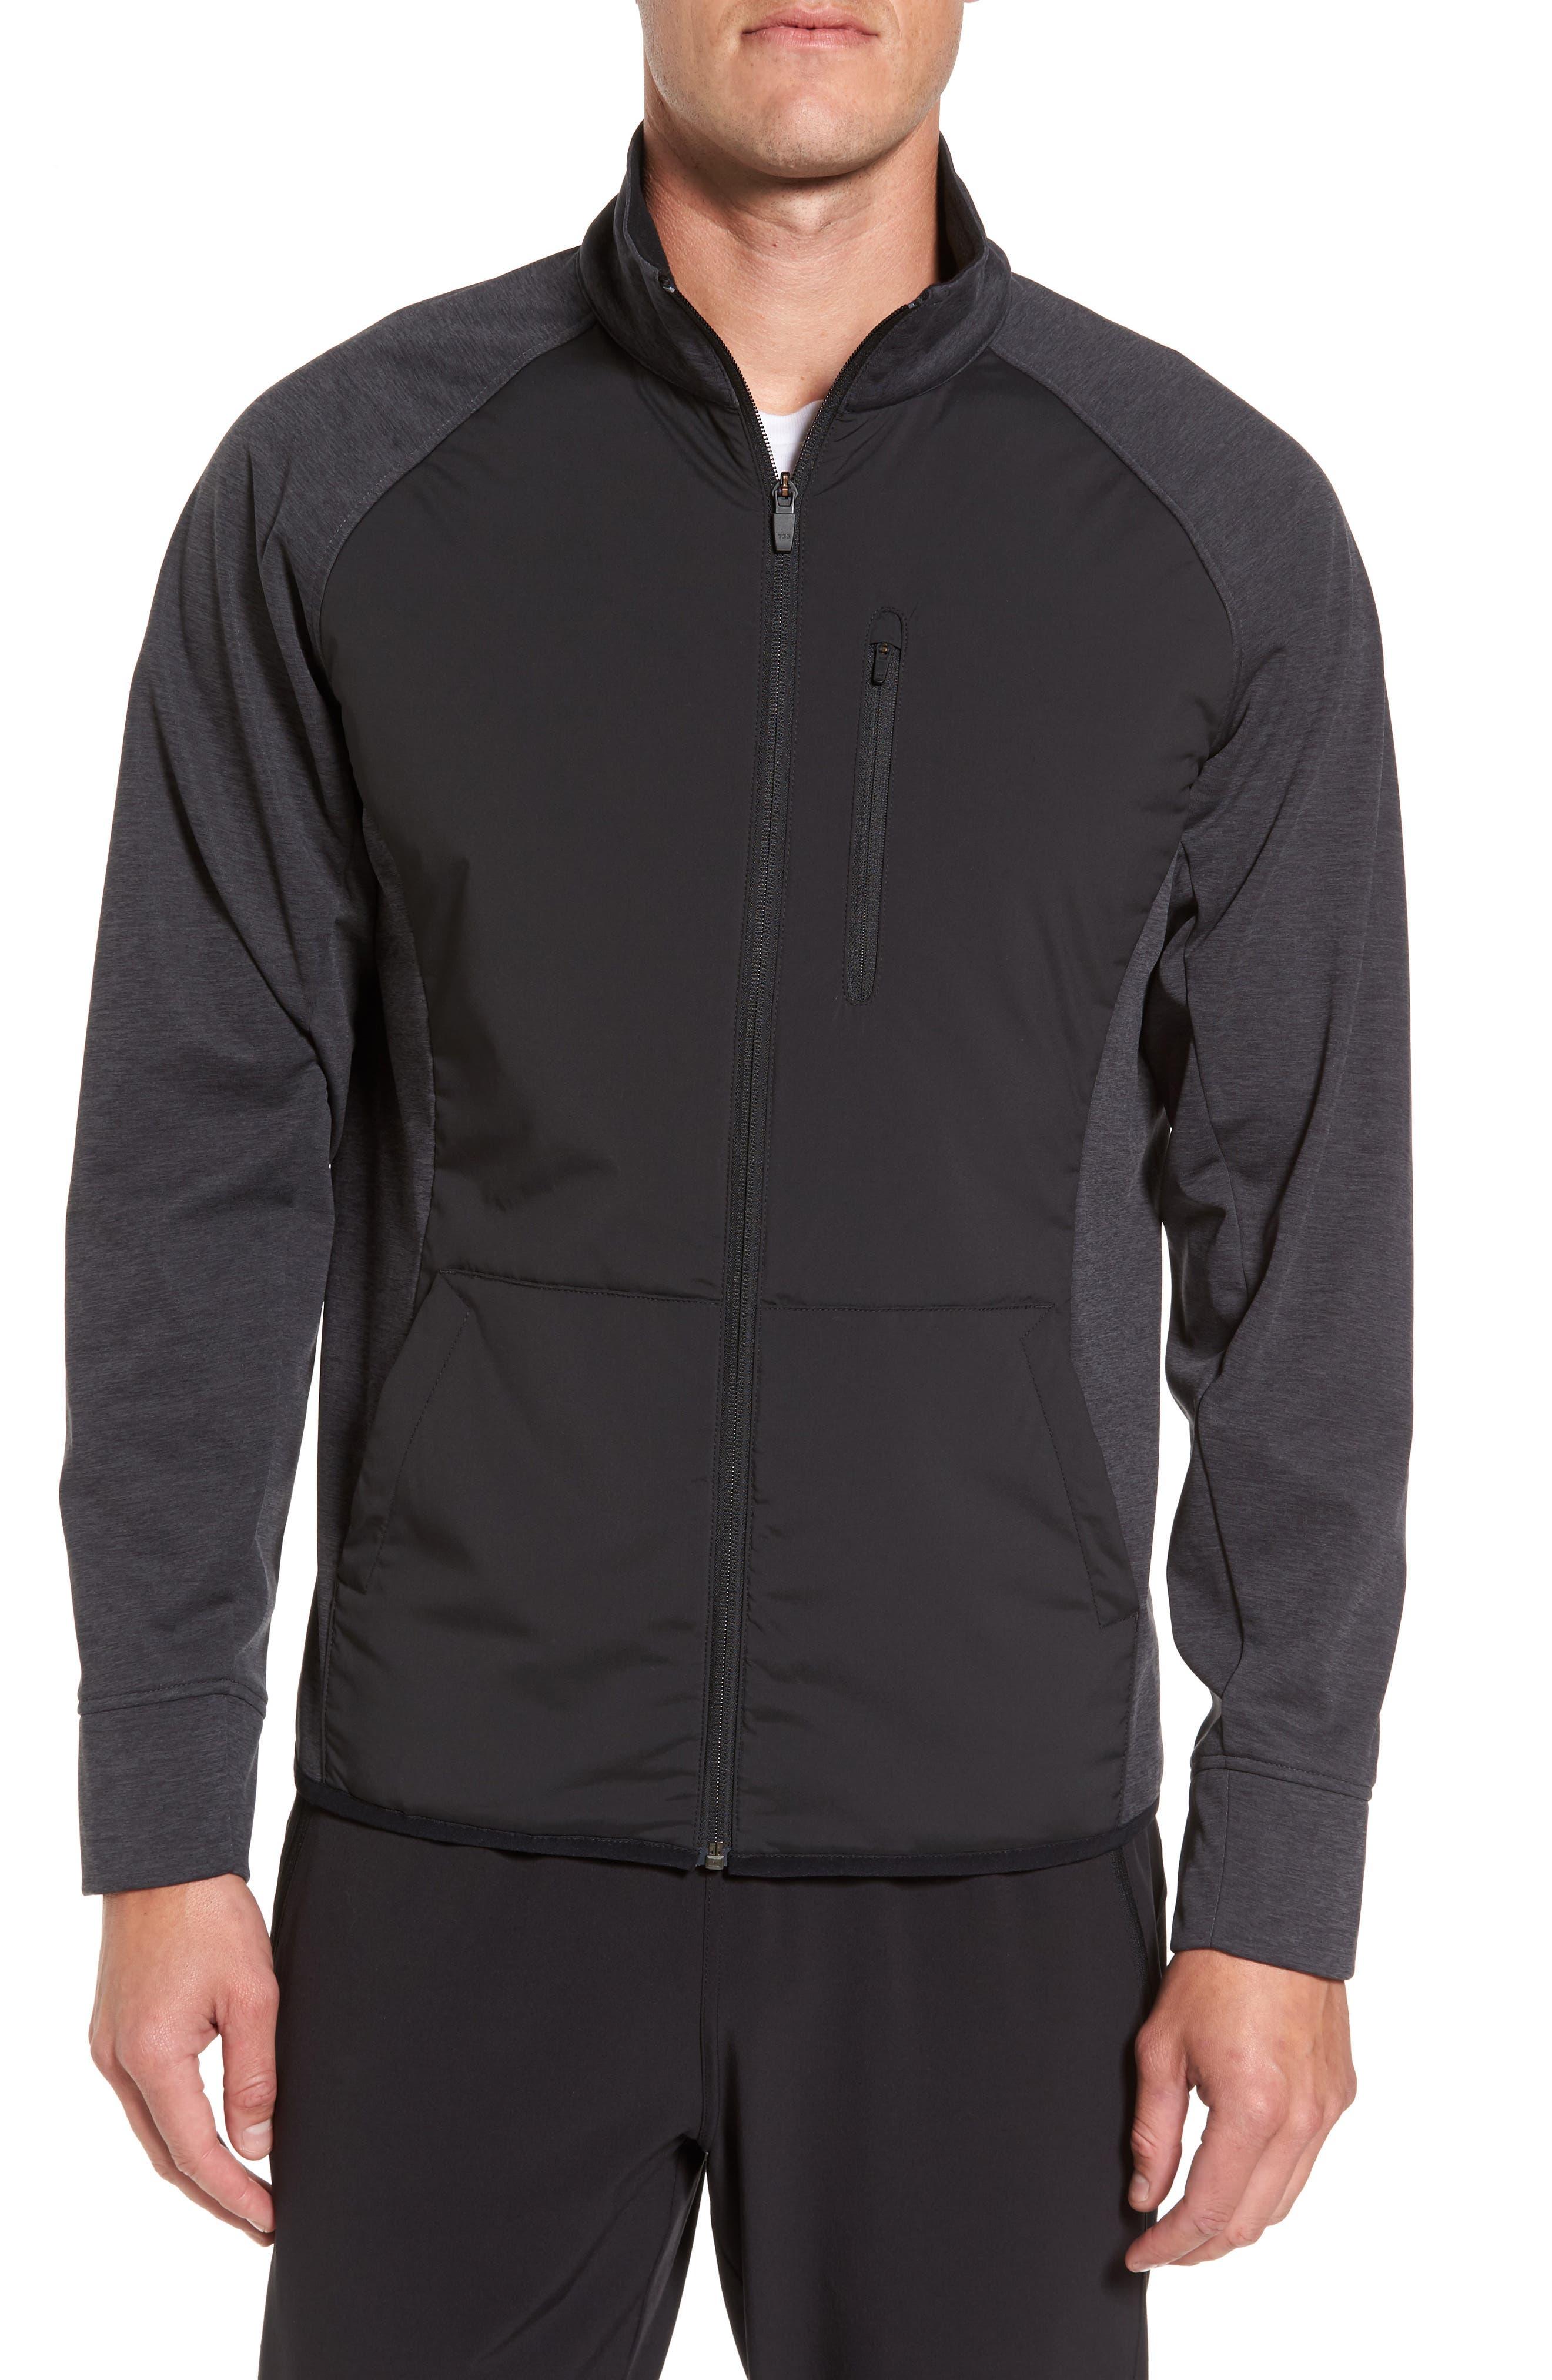 Zelfusion Tech Track Jacket,                         Main,                         color, 001